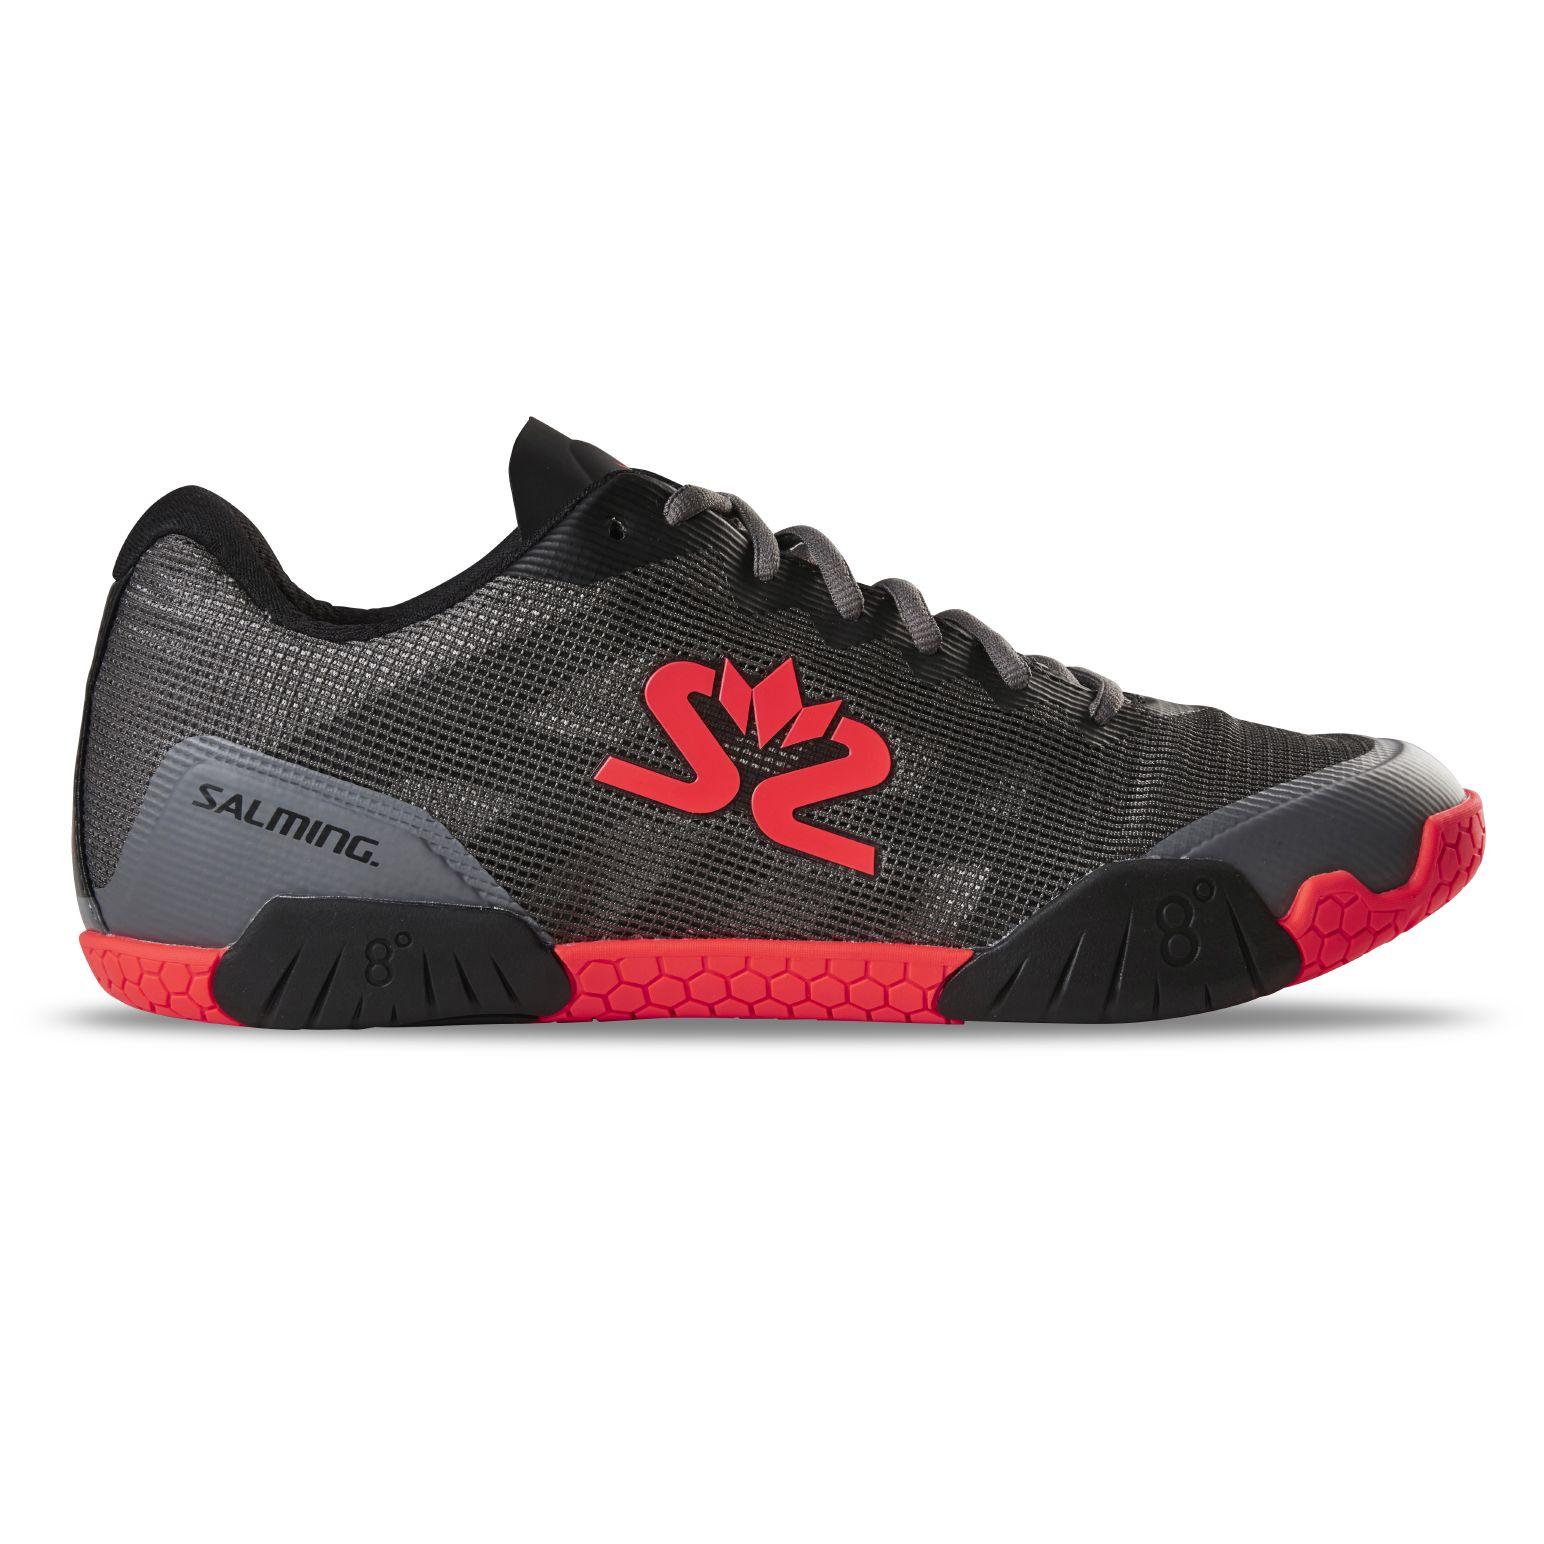 Salming Hawk Shoe Men GunMetal/Red 7 UK - 41 1/3 EUR - 26 cm